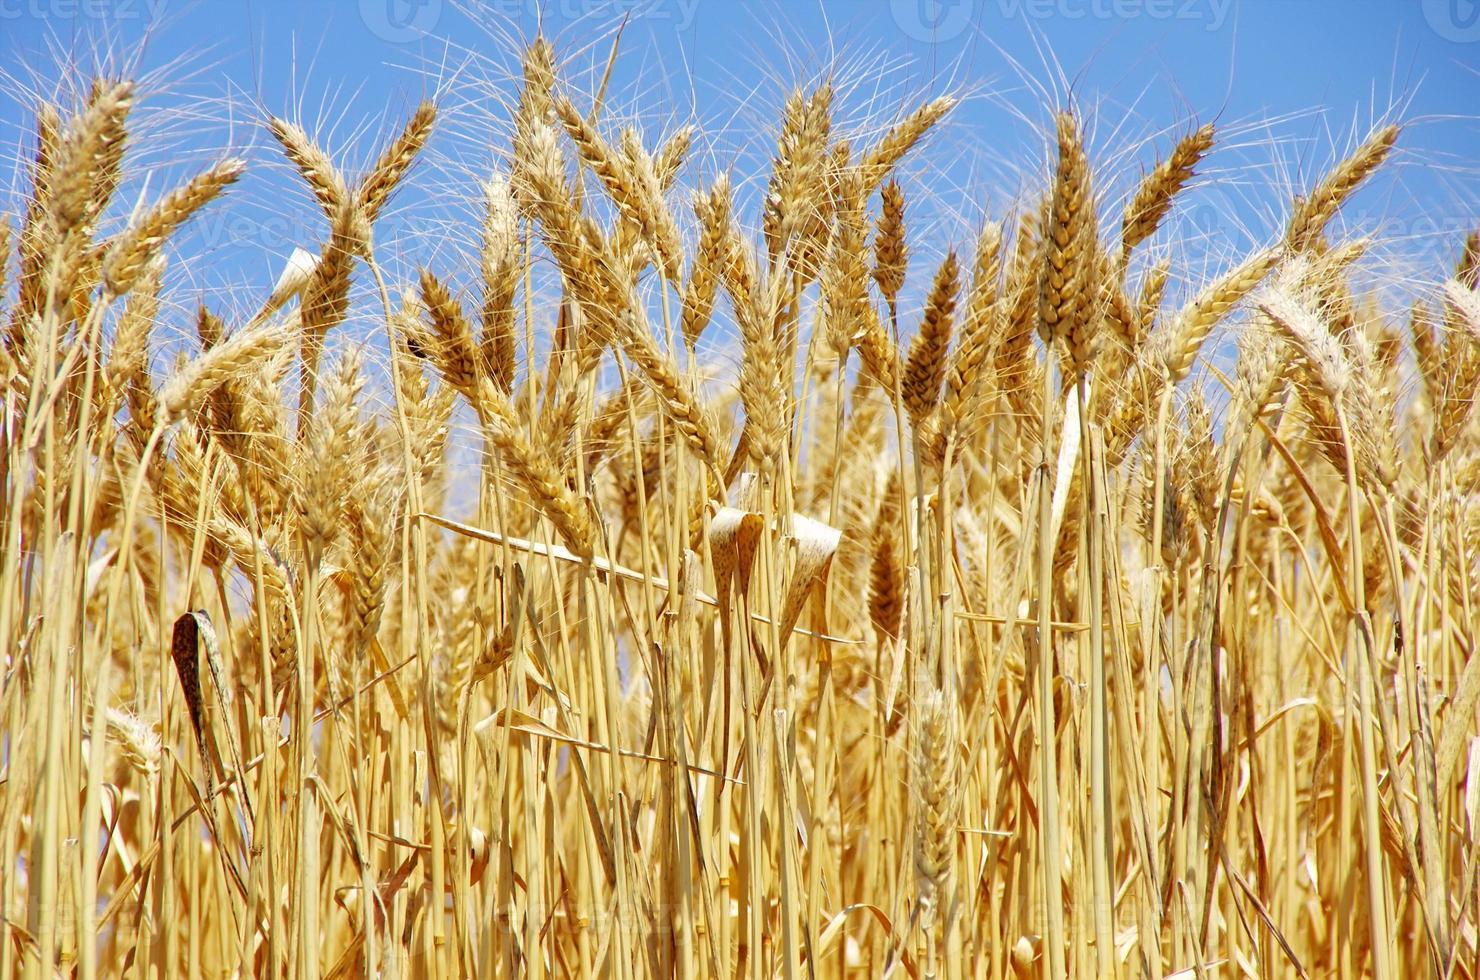 Ripe spikes of wheat photo